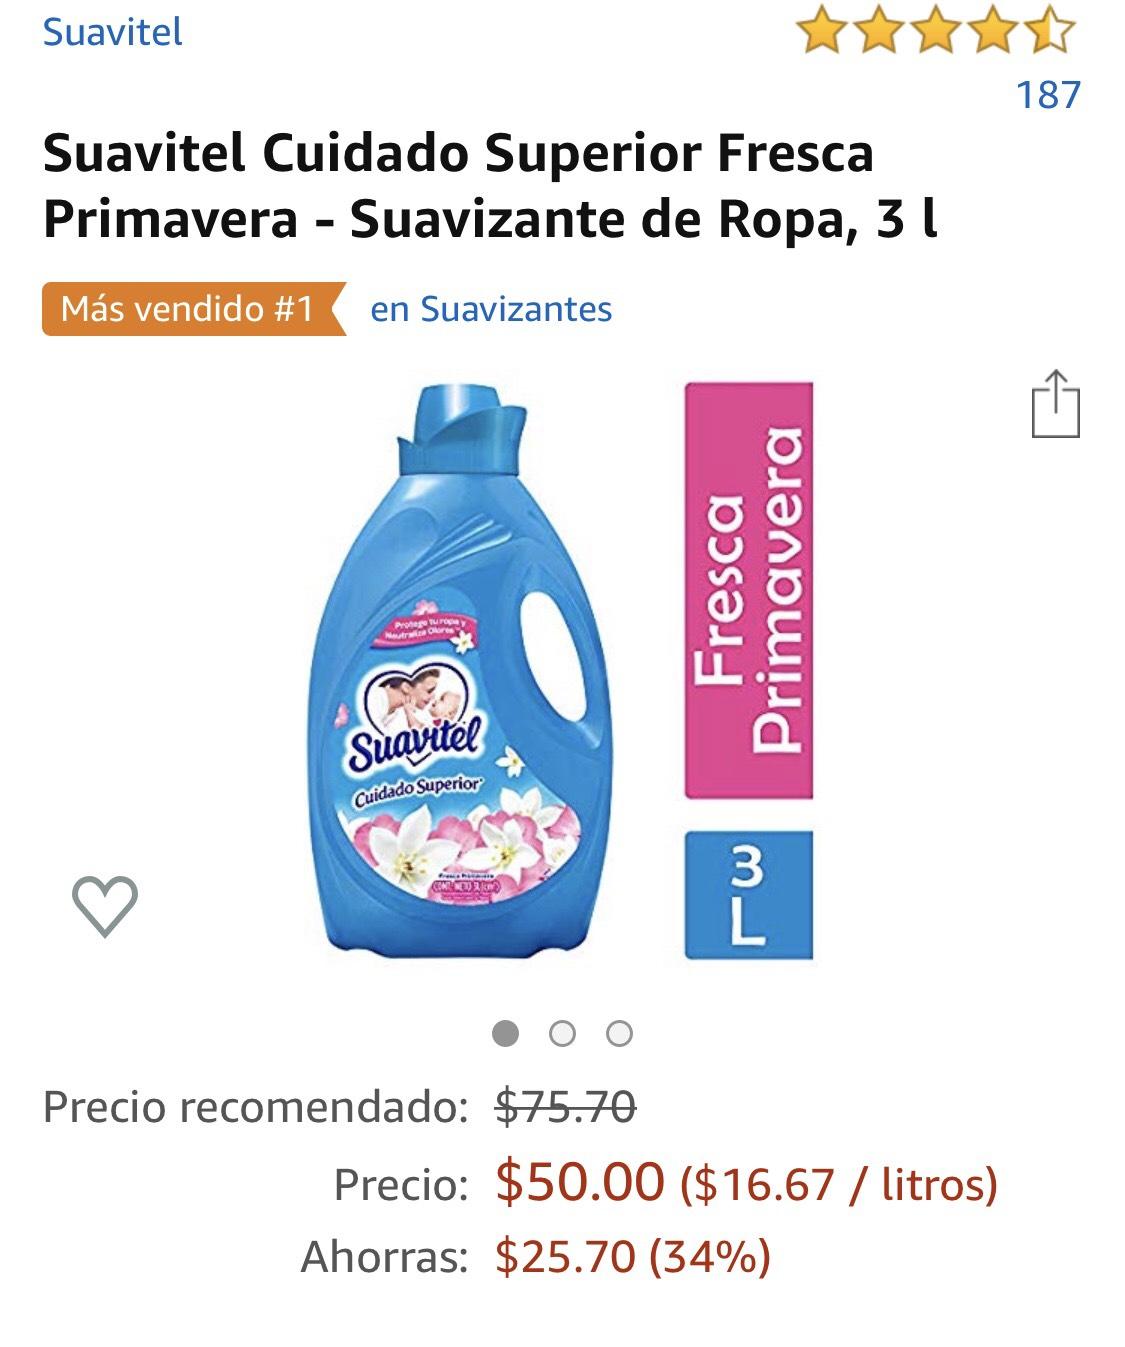 Amazon Suavitel Cuidado Superior Fresca Primavera - Suavizante de Ropa, 3 l